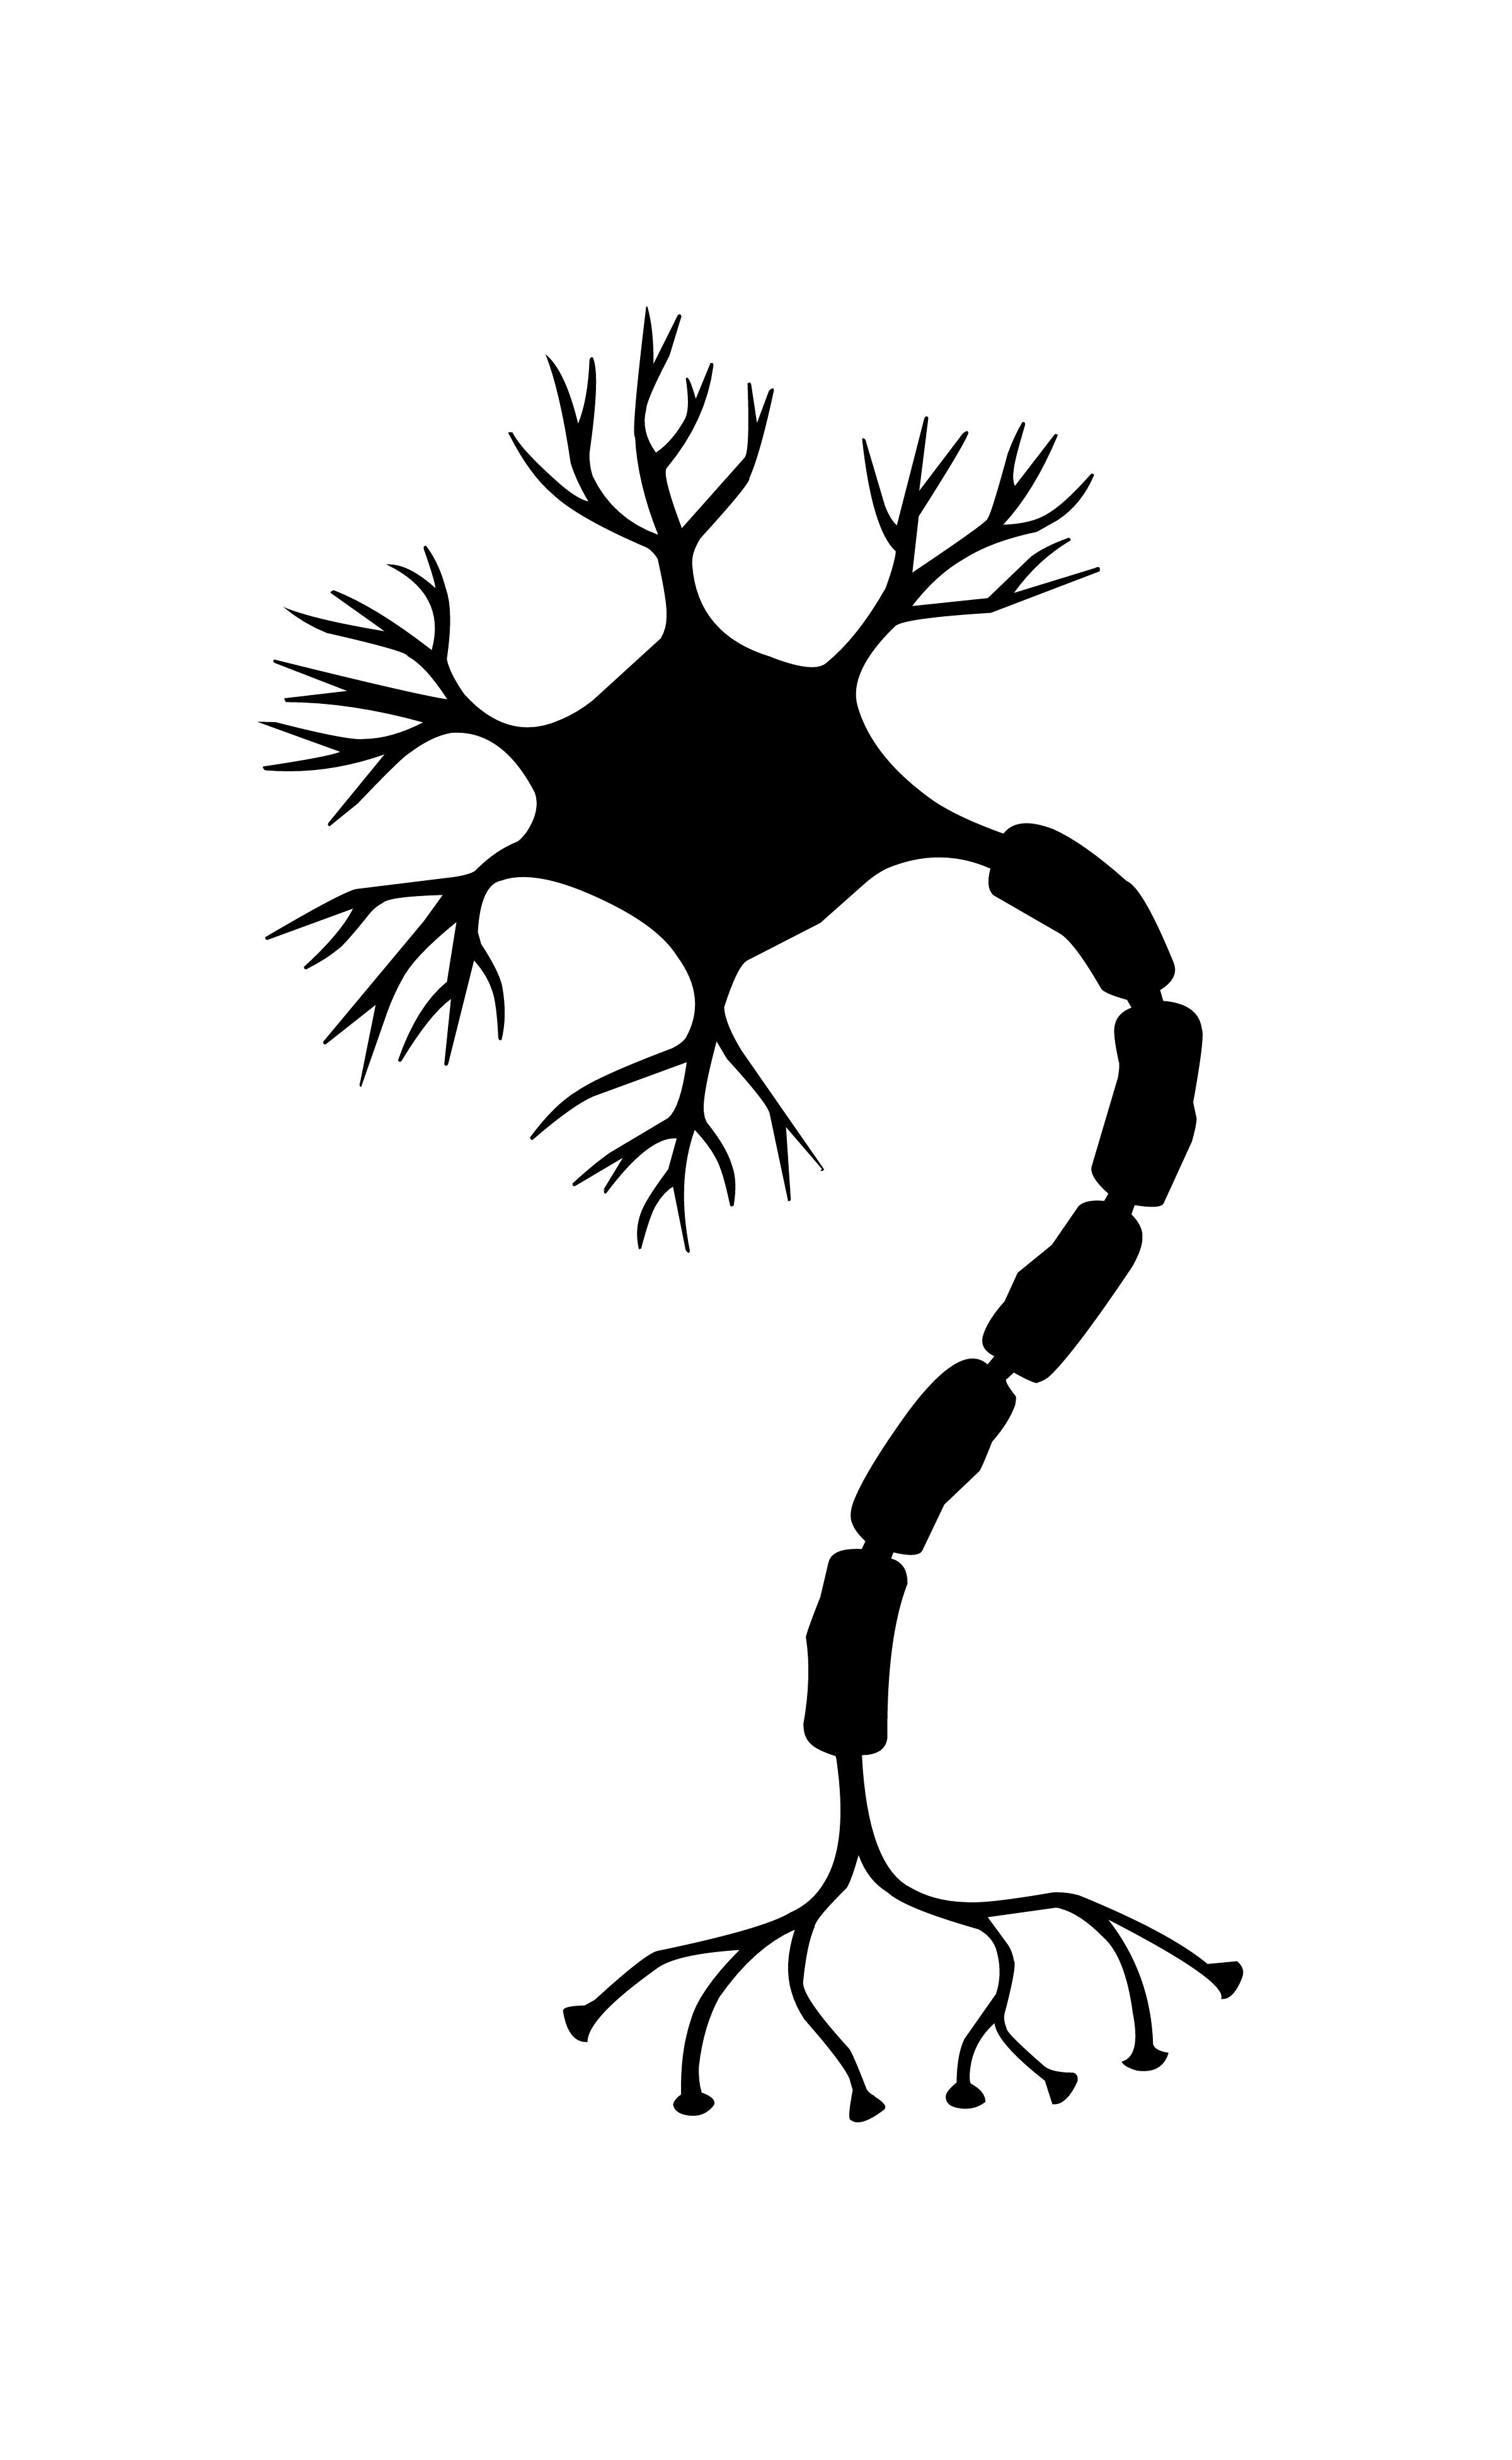 Free Images Nerve Cell Neuron Brain Neurons Nervous System